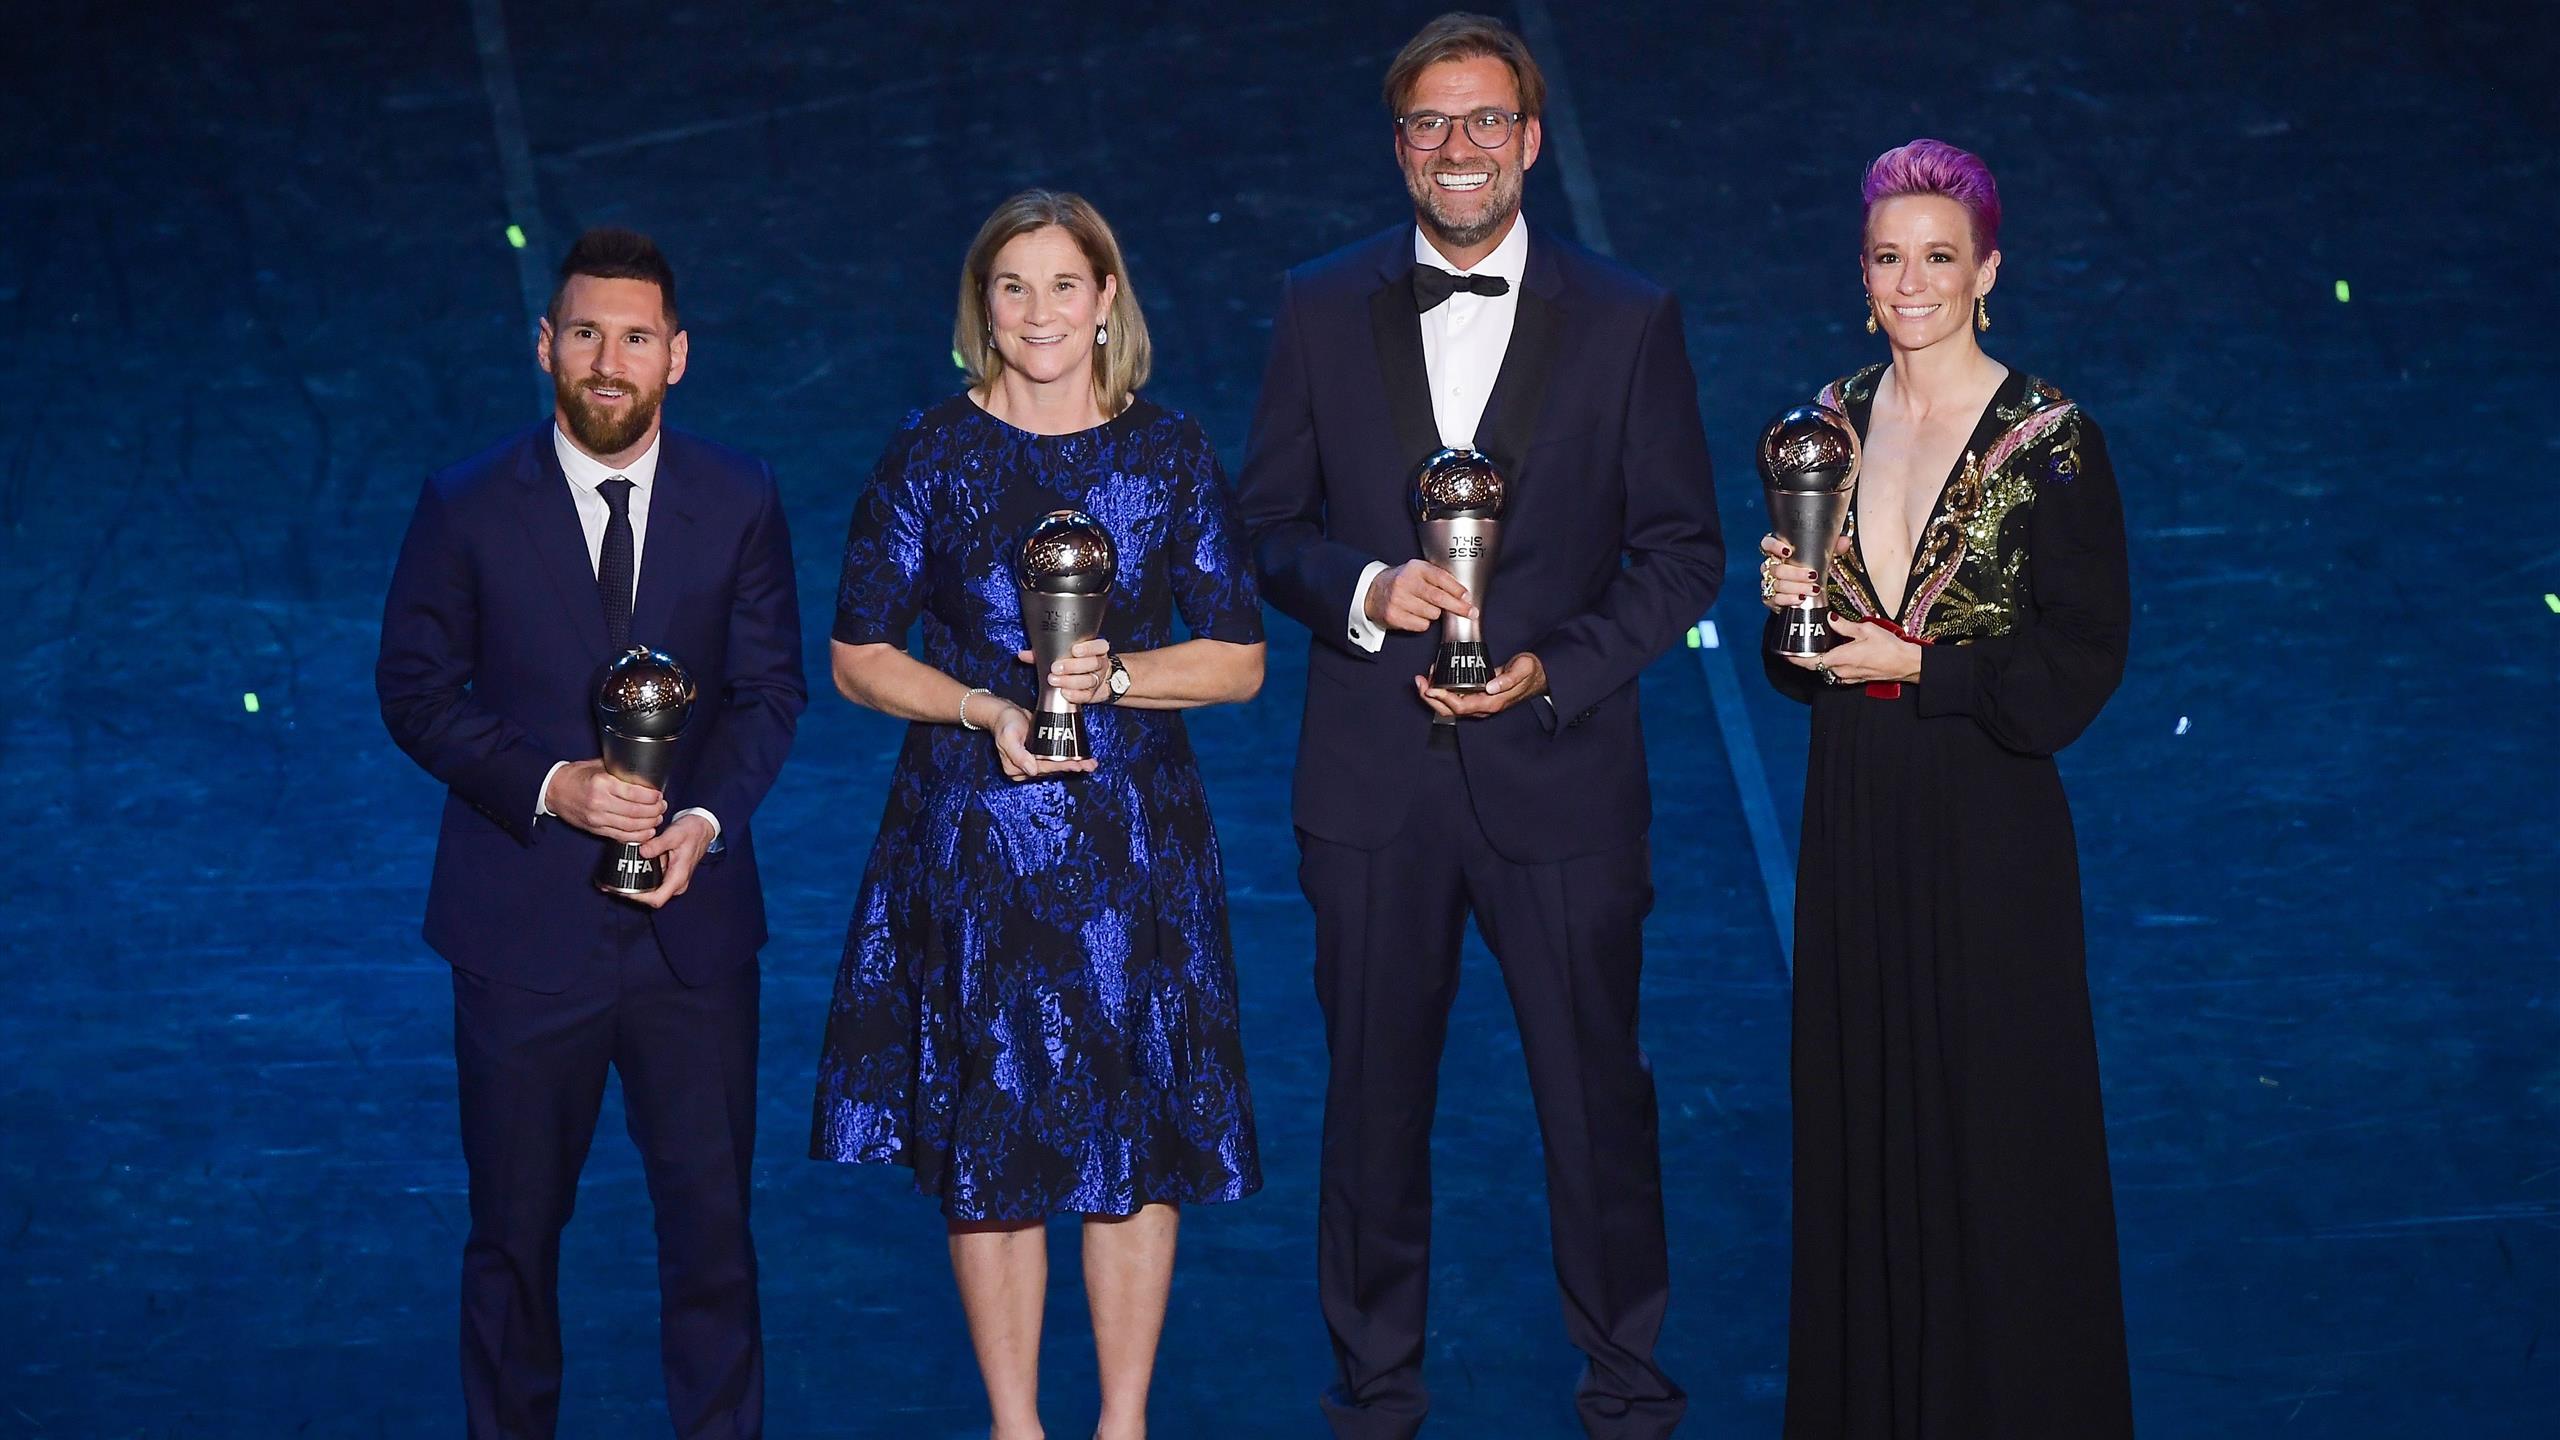 The Best Fifa Football Awards How The Awards Unfolded As Messi Beats Van Dijk To Men S Prize Eurosport